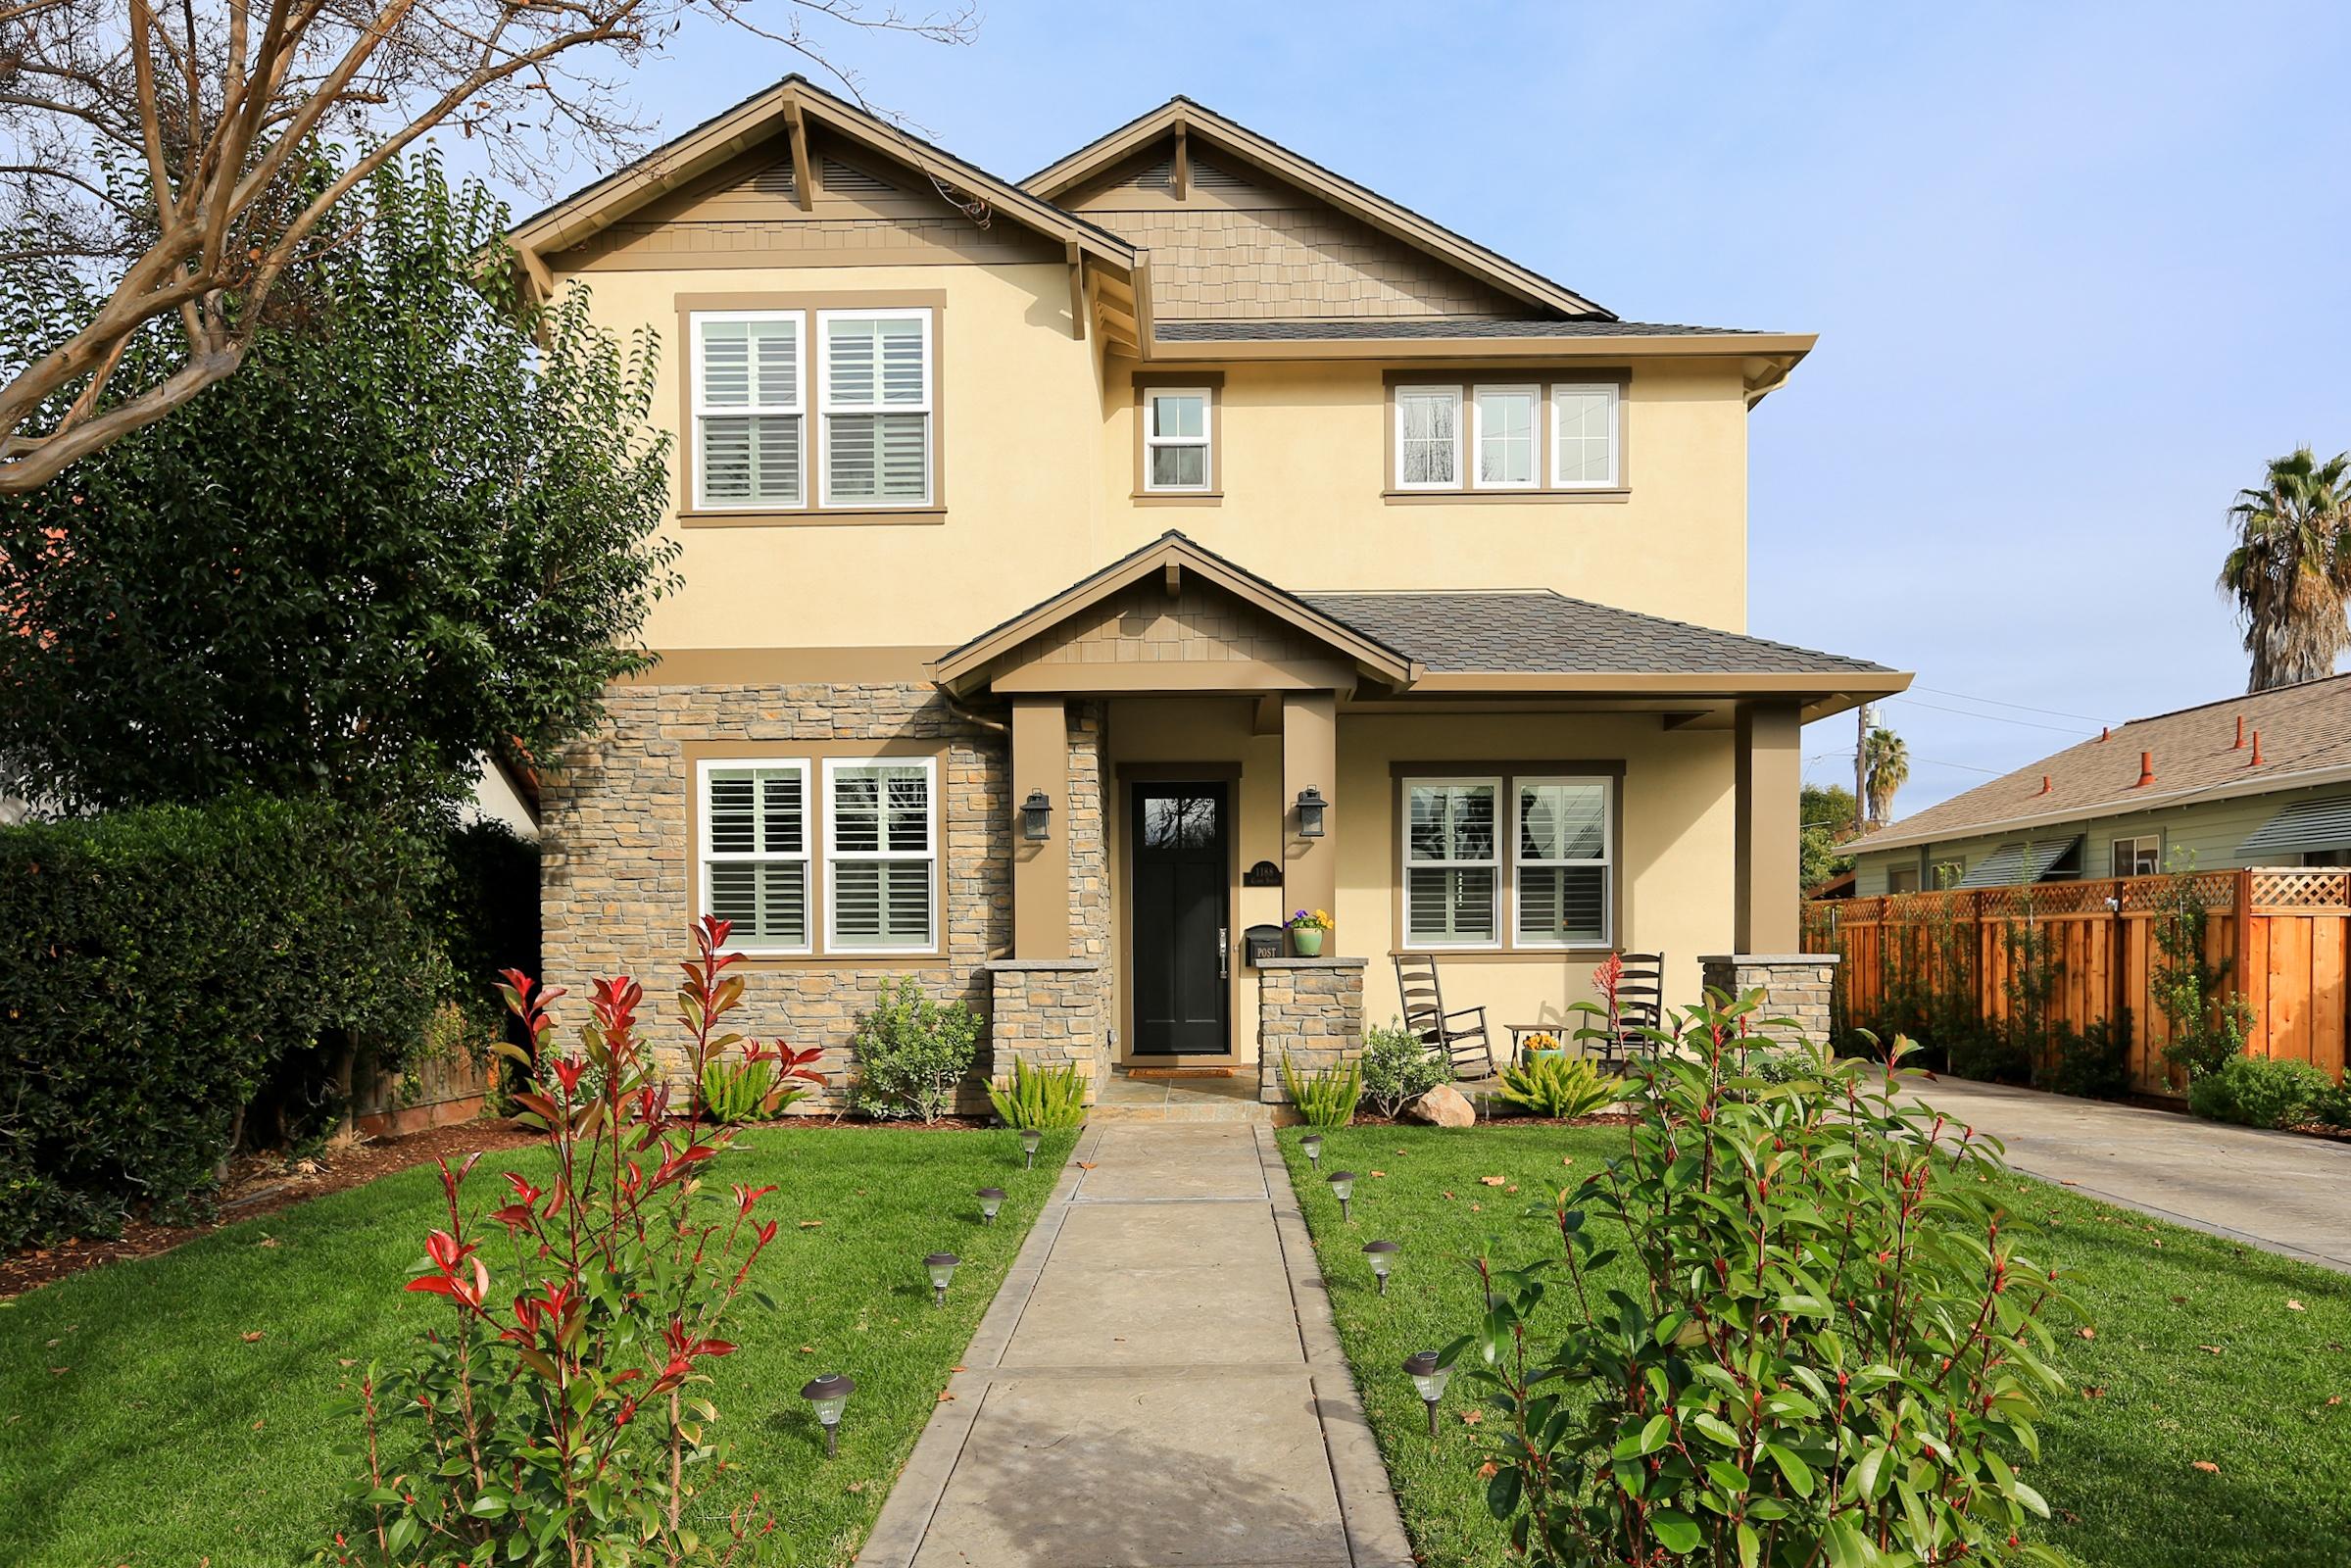 Property For Sale at 1188 Clark Street, SAN JOSE